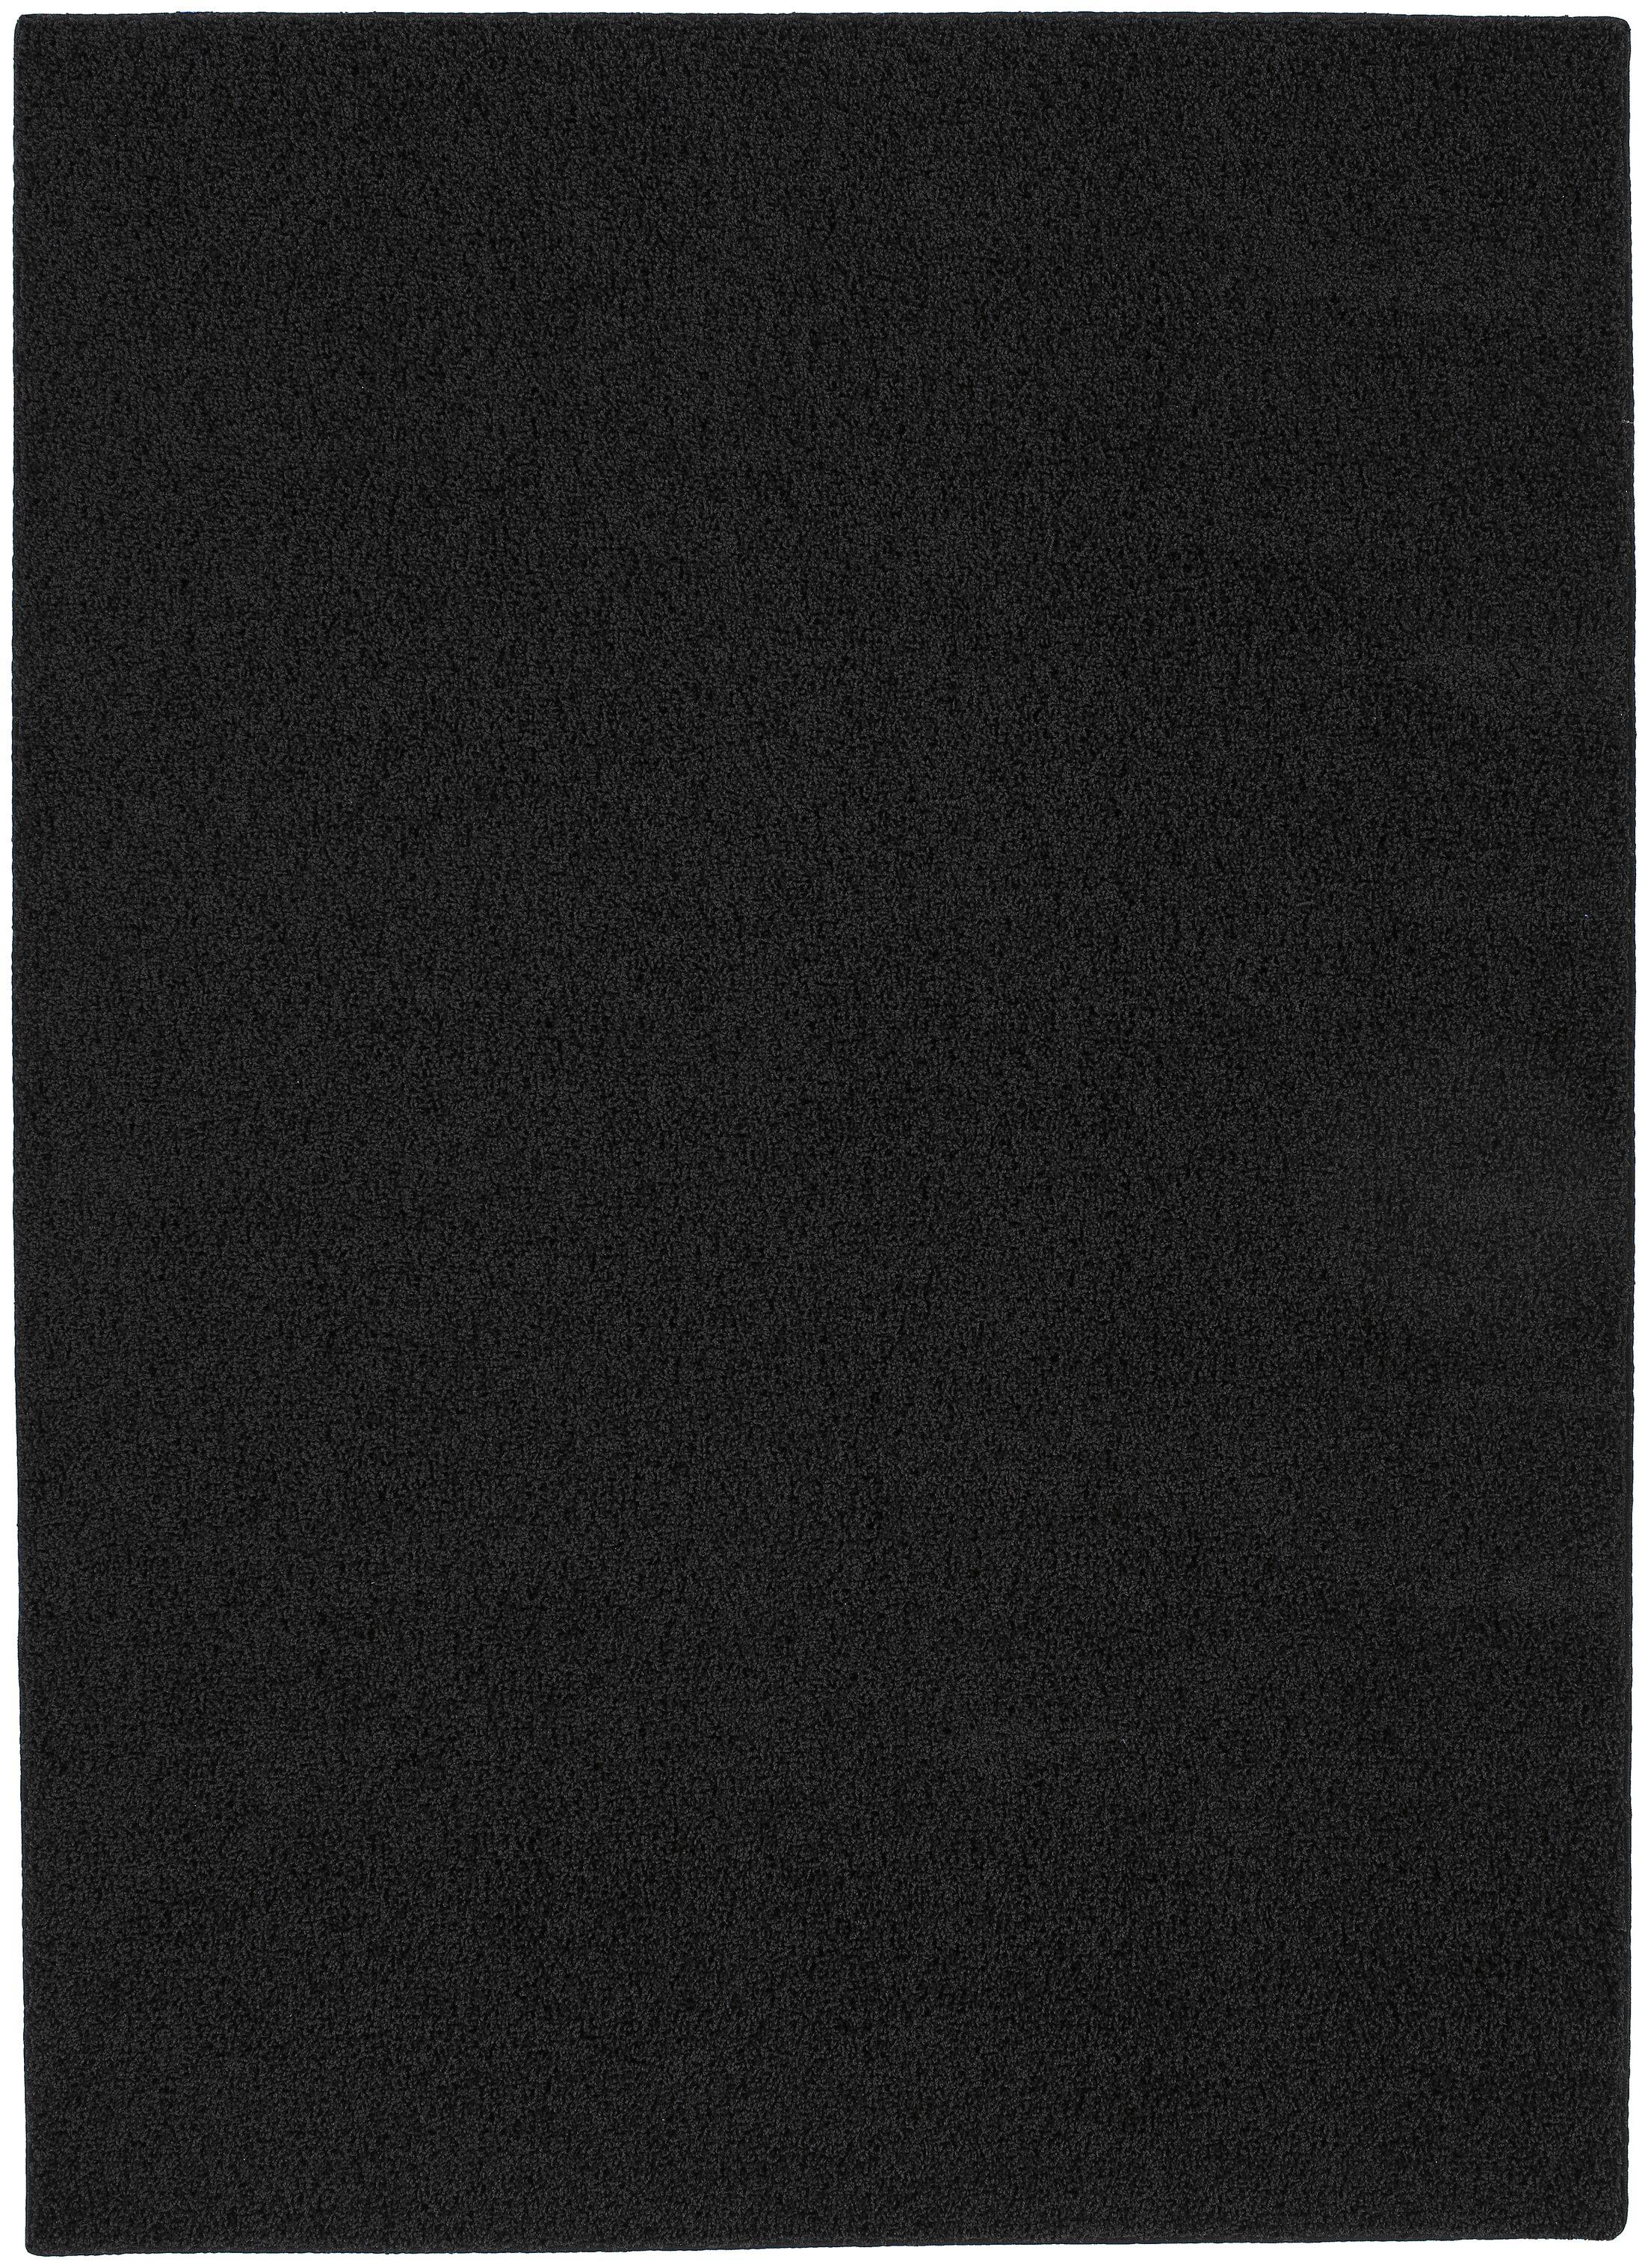 Blackest Black Shazaam Area Rug Rug Size: 4' x 6'